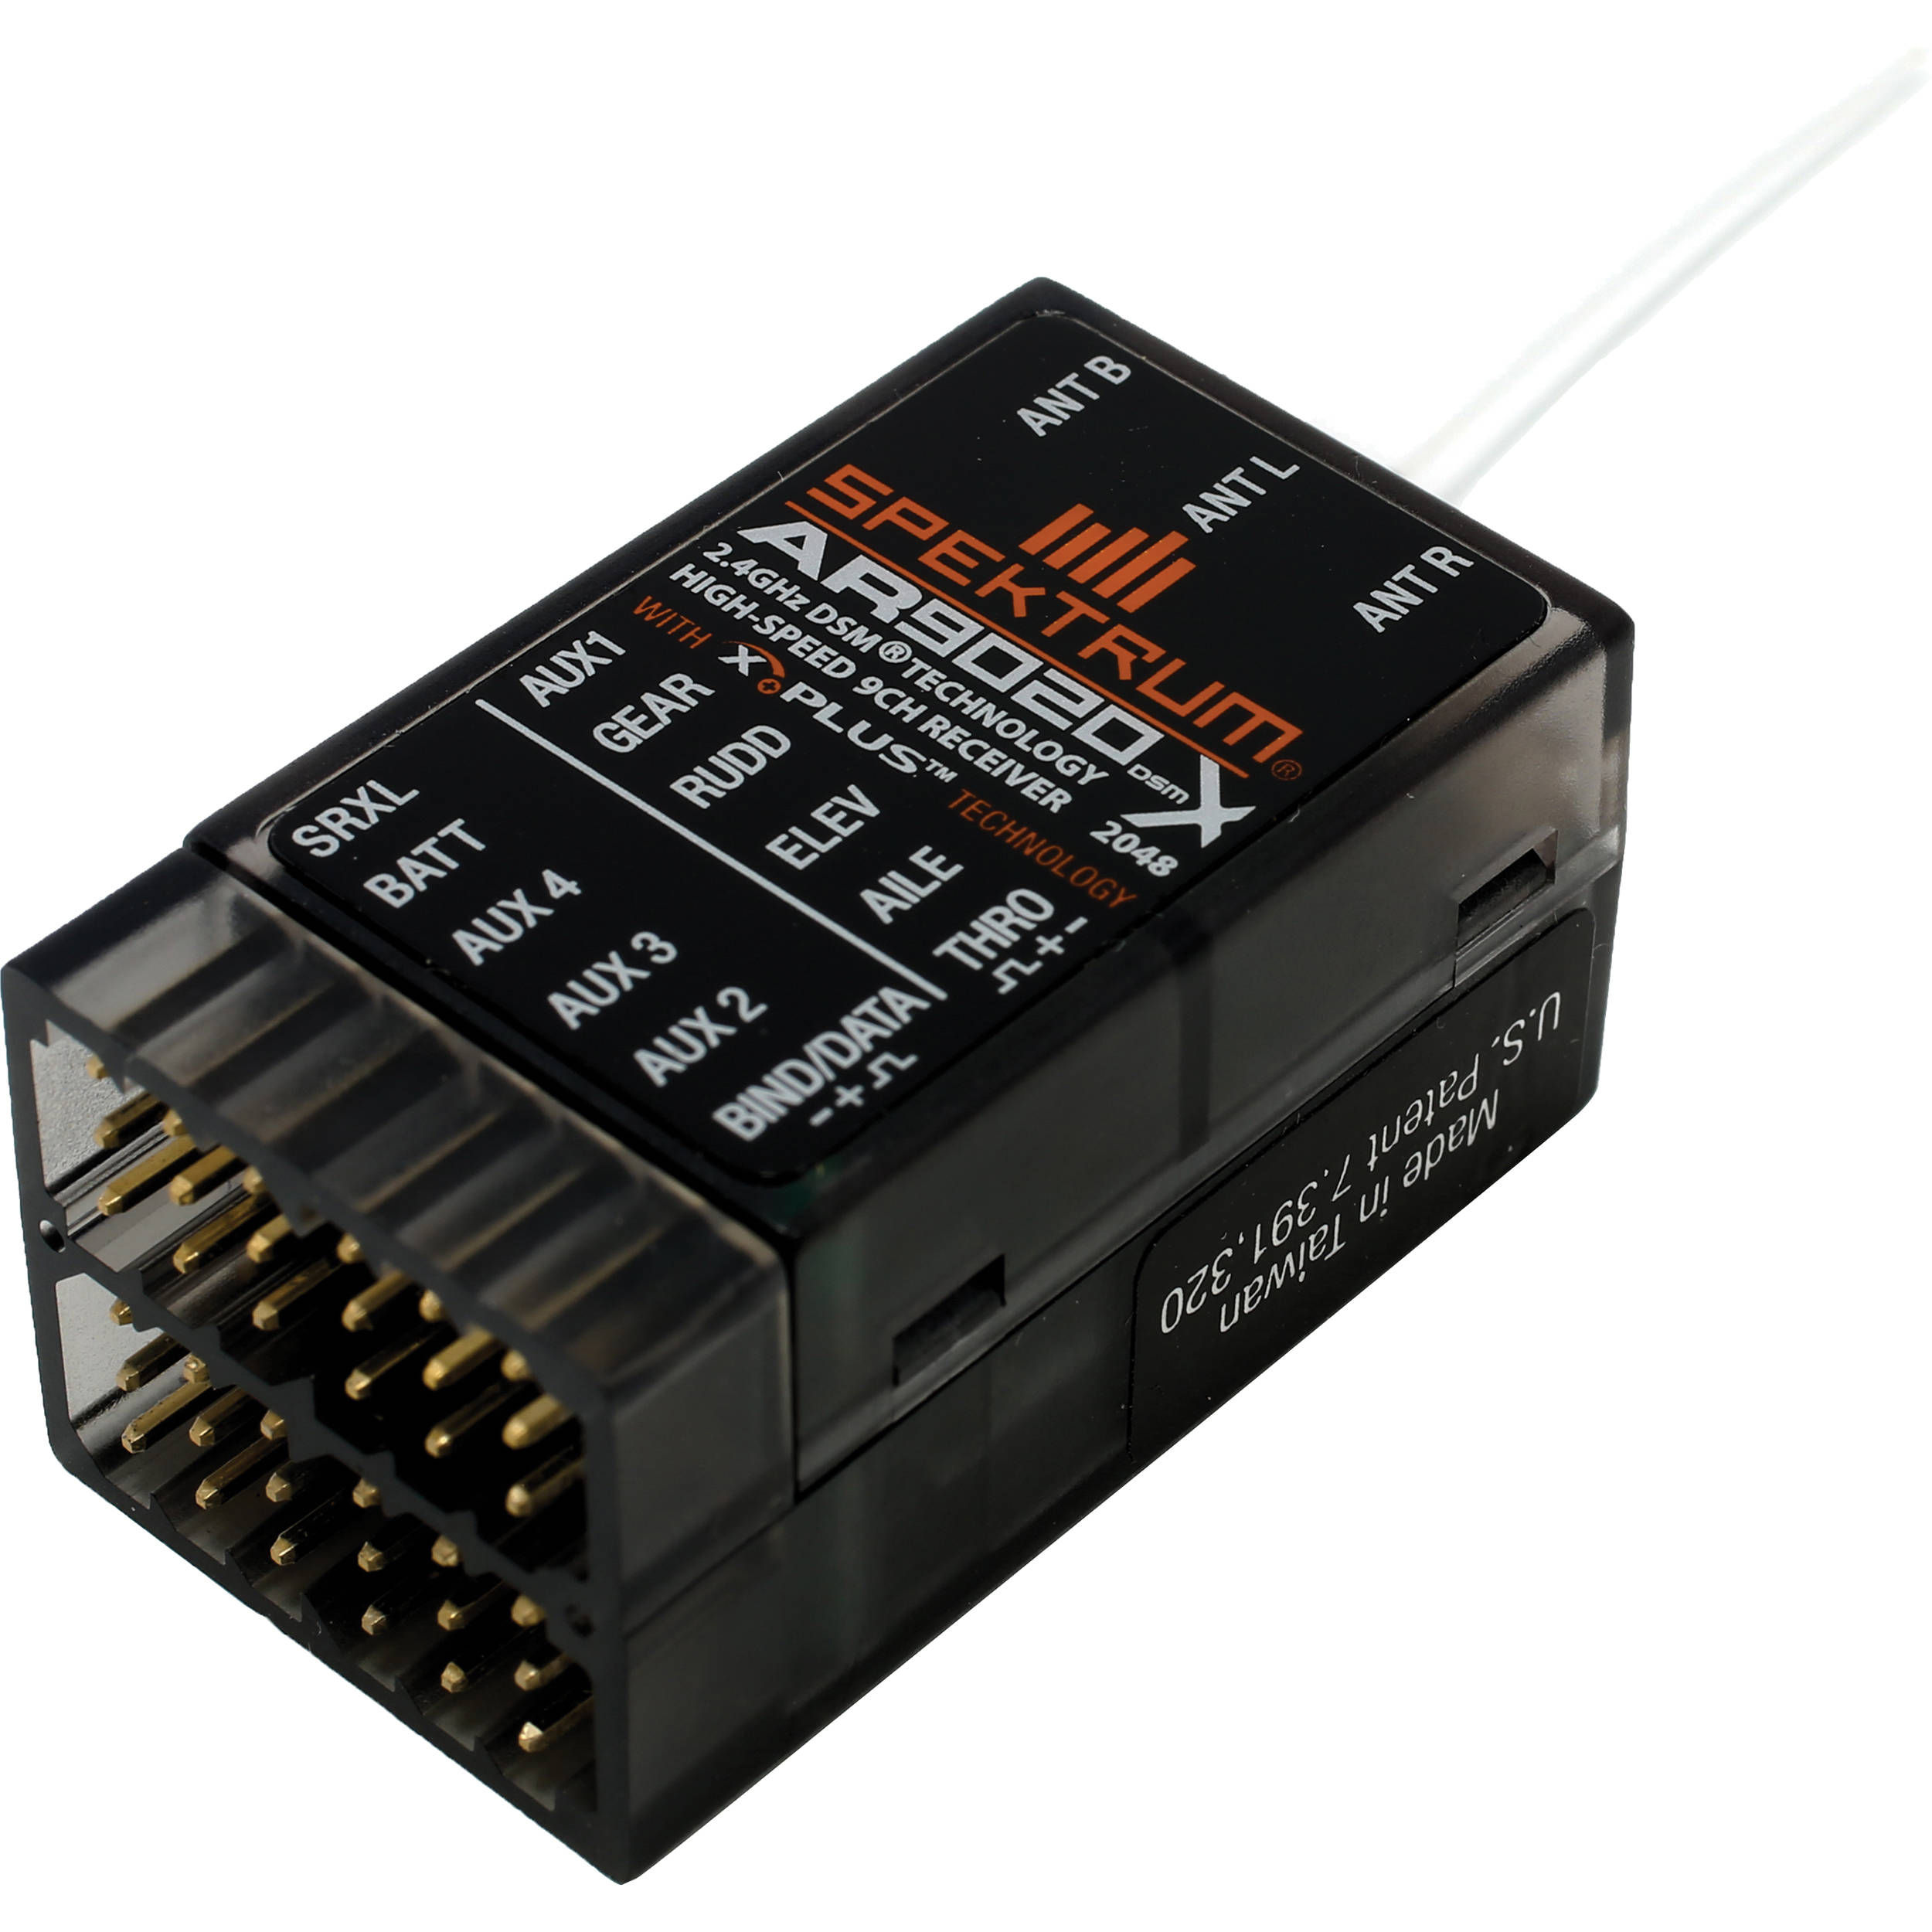 Spektrum AR9020 9-Channel DSMX X-Plus Receiver SPMAR9020 B&H